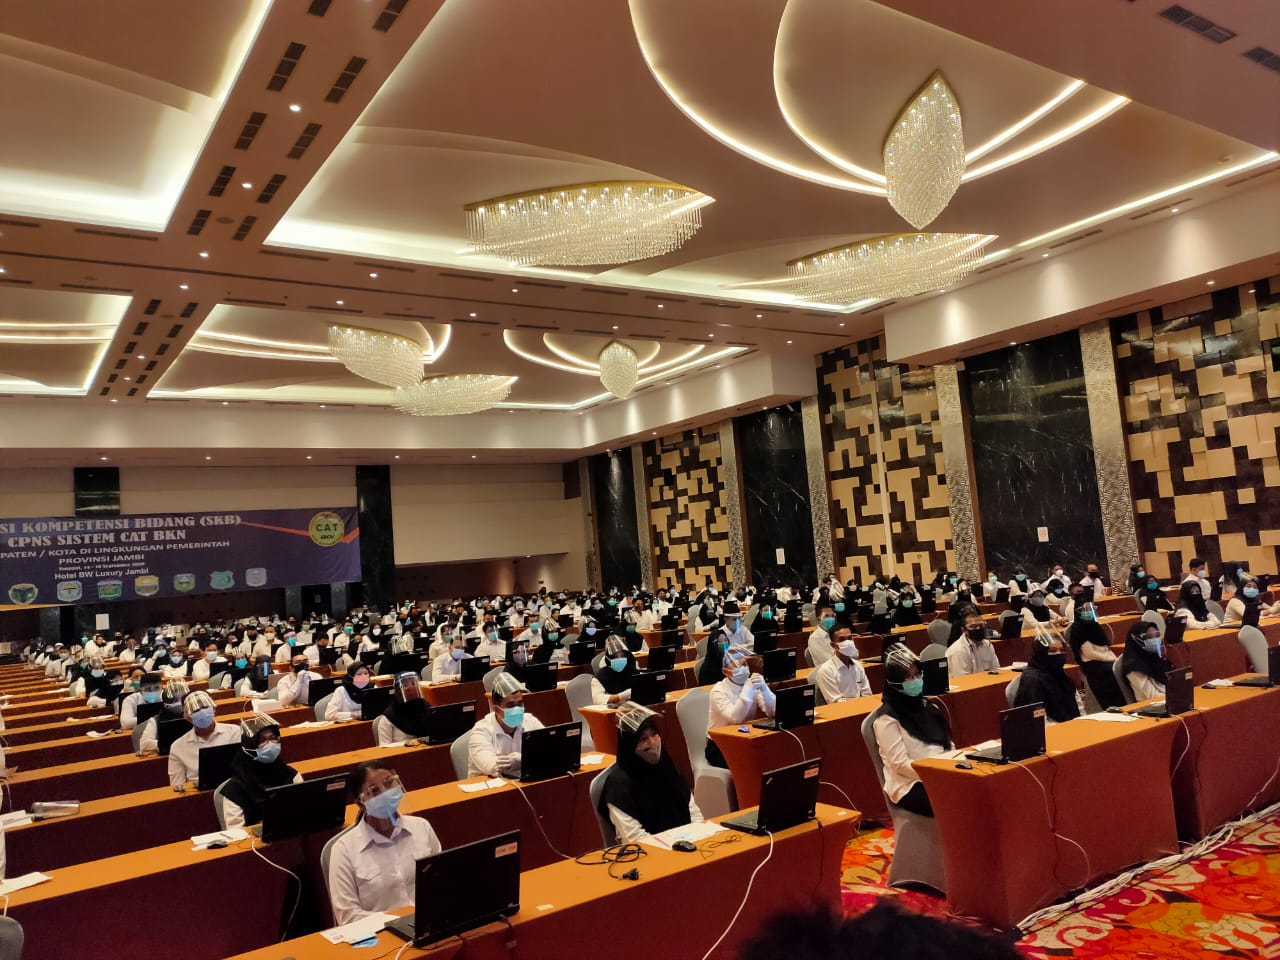 Ratusan Peserta Seleksi CPNS Tanjabbar Ikuti Tes SKB